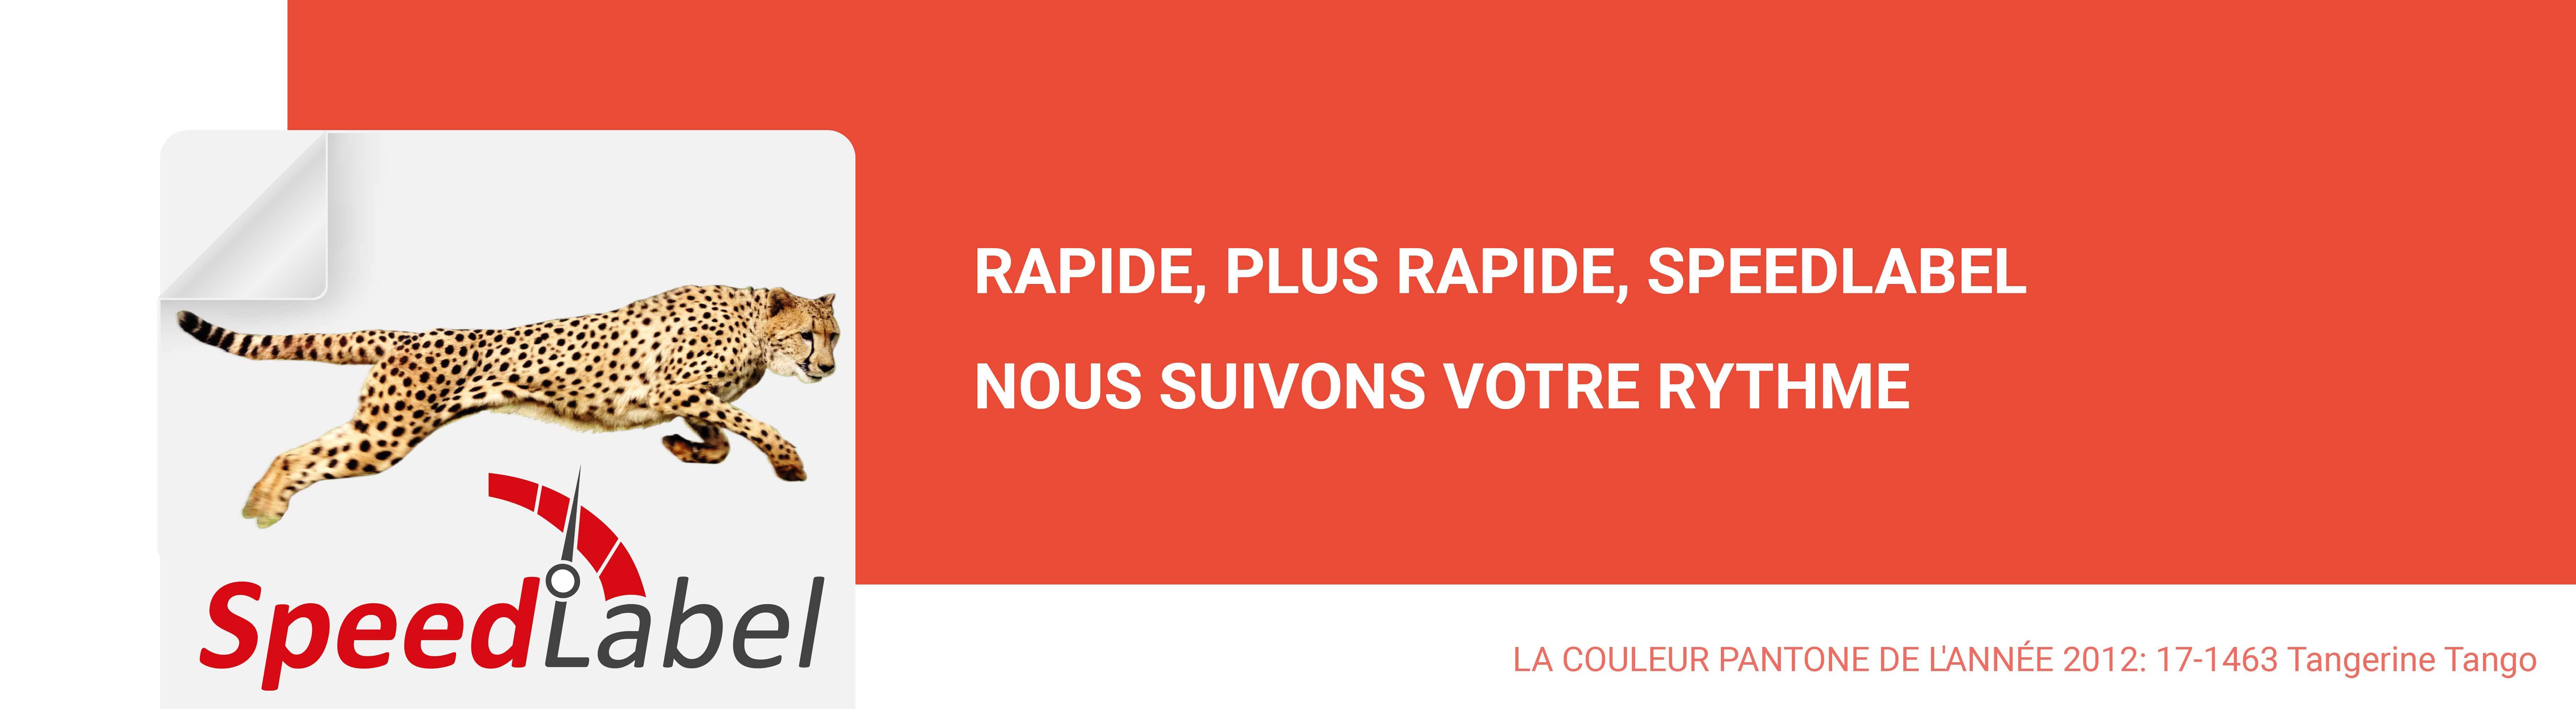 SPEEDLABEL Innovastore France